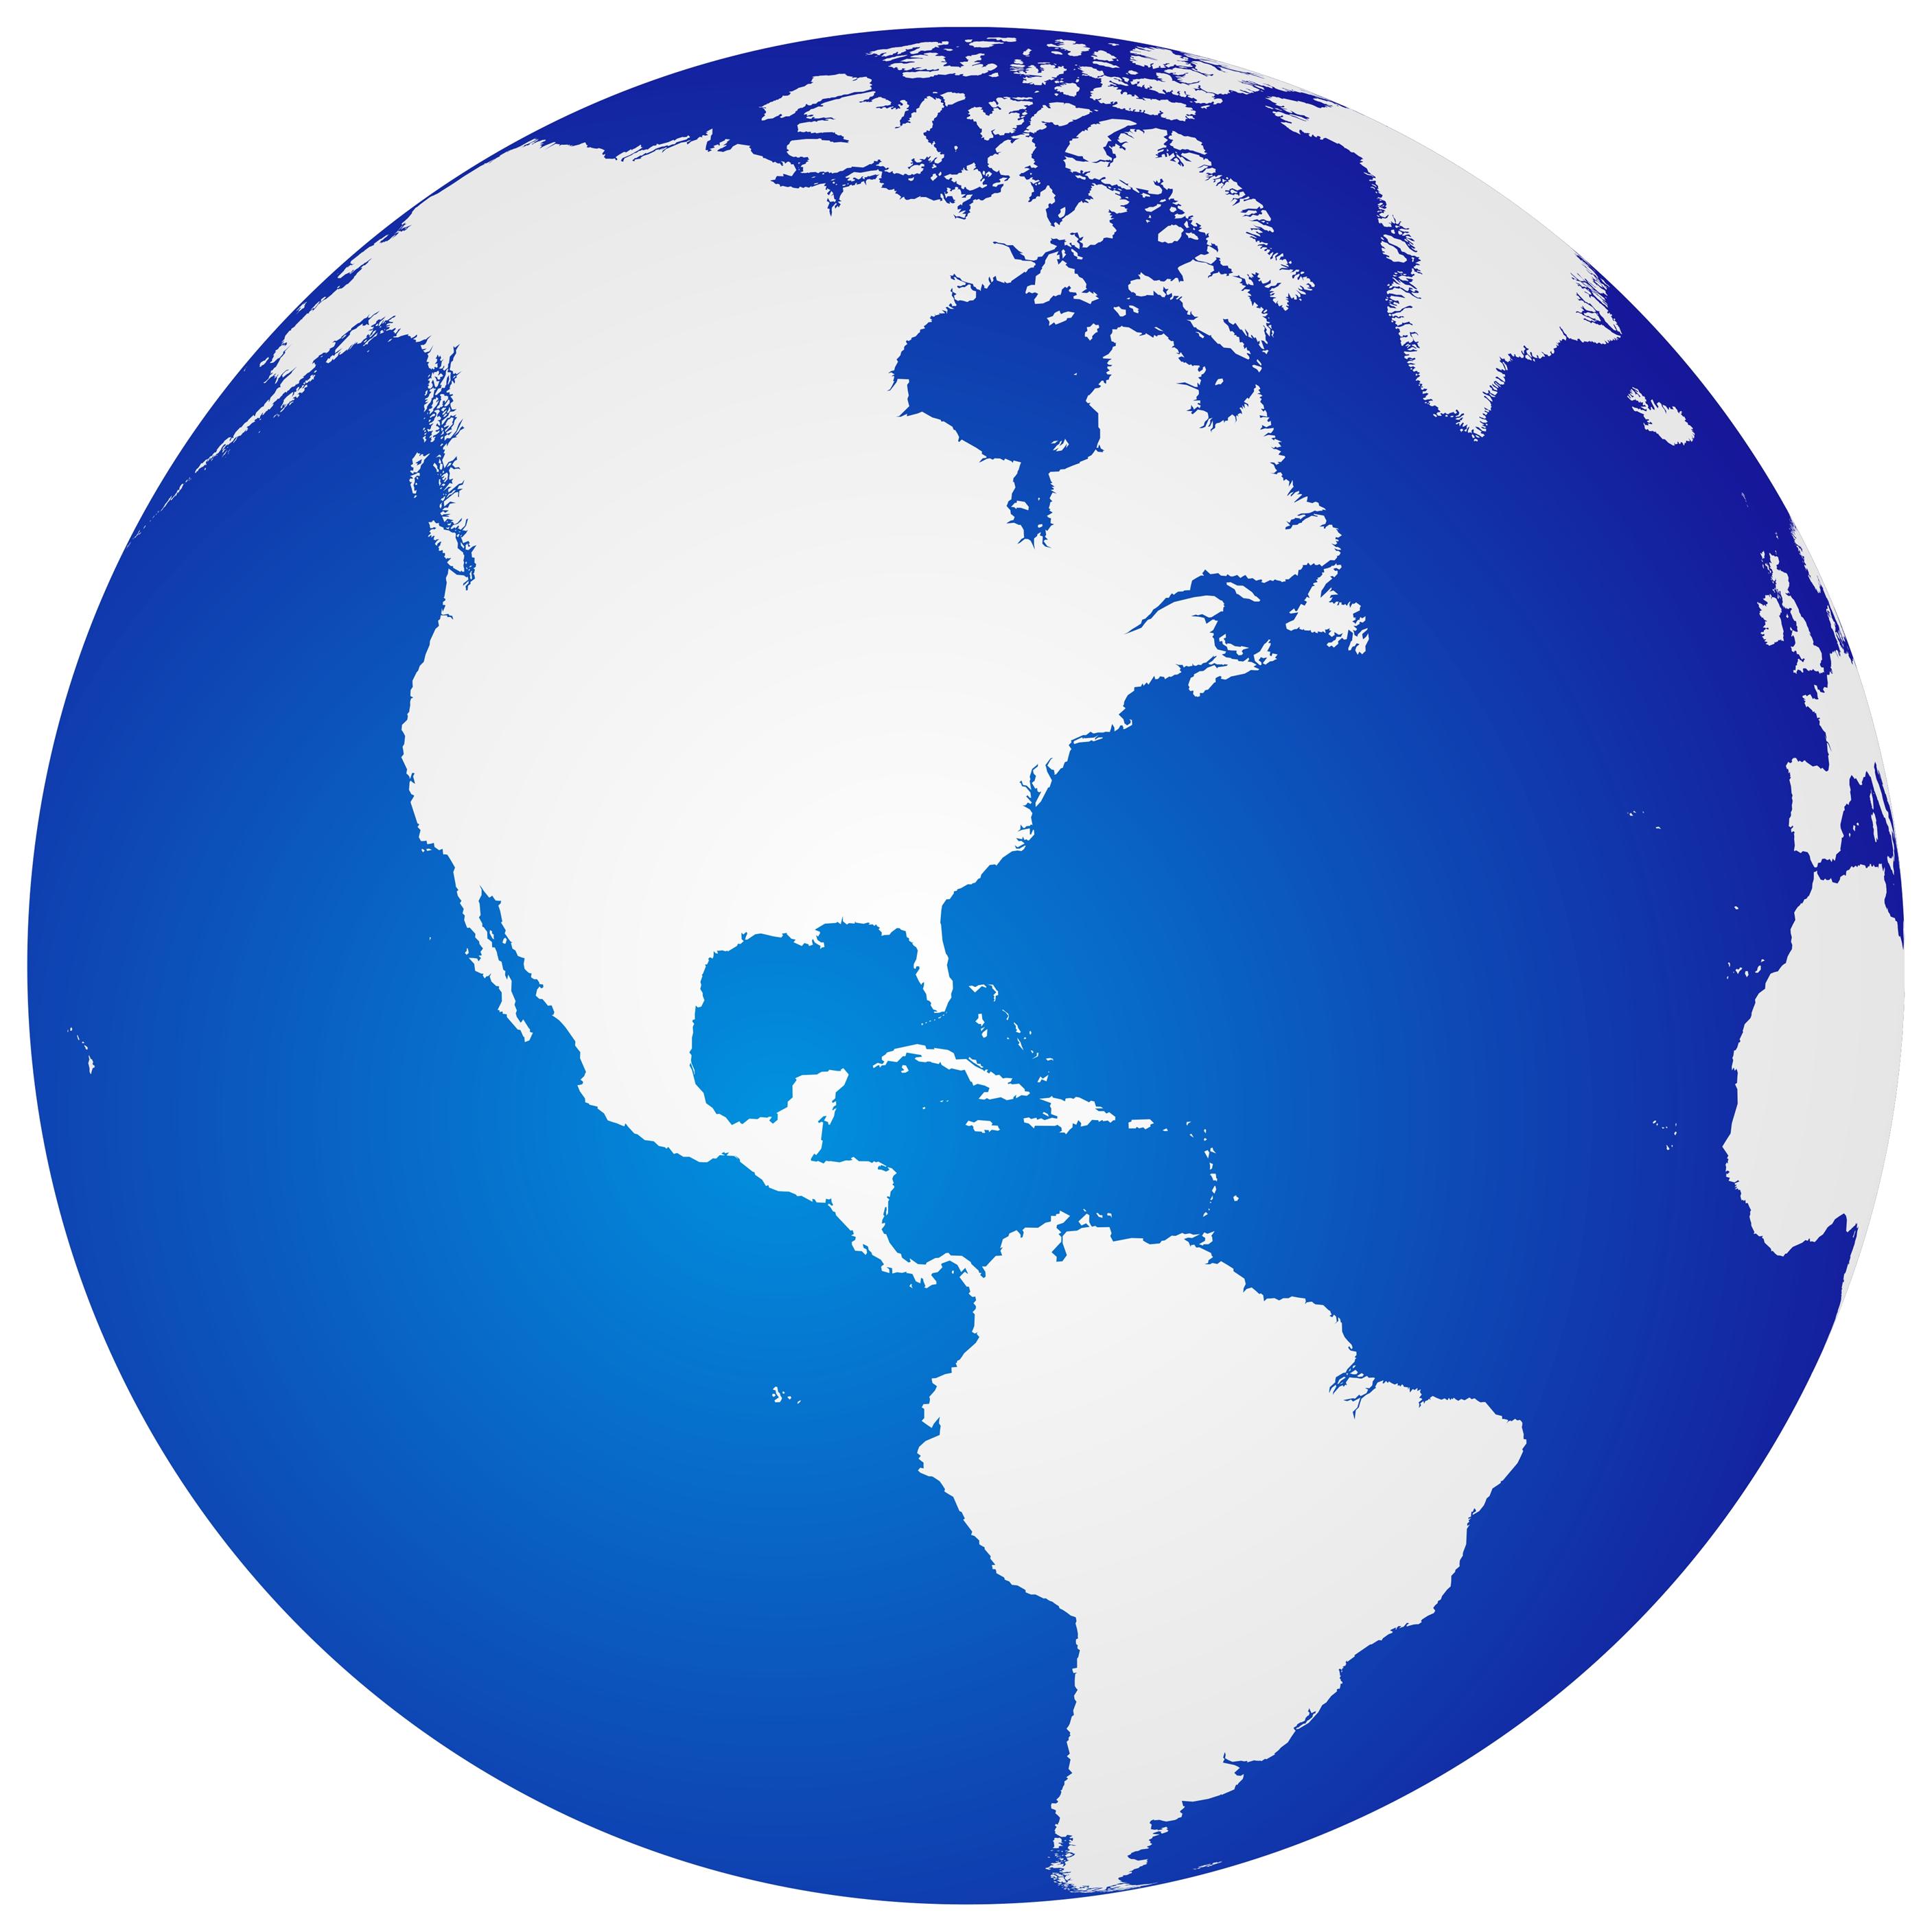 World PNG Images Transparent Free Download.